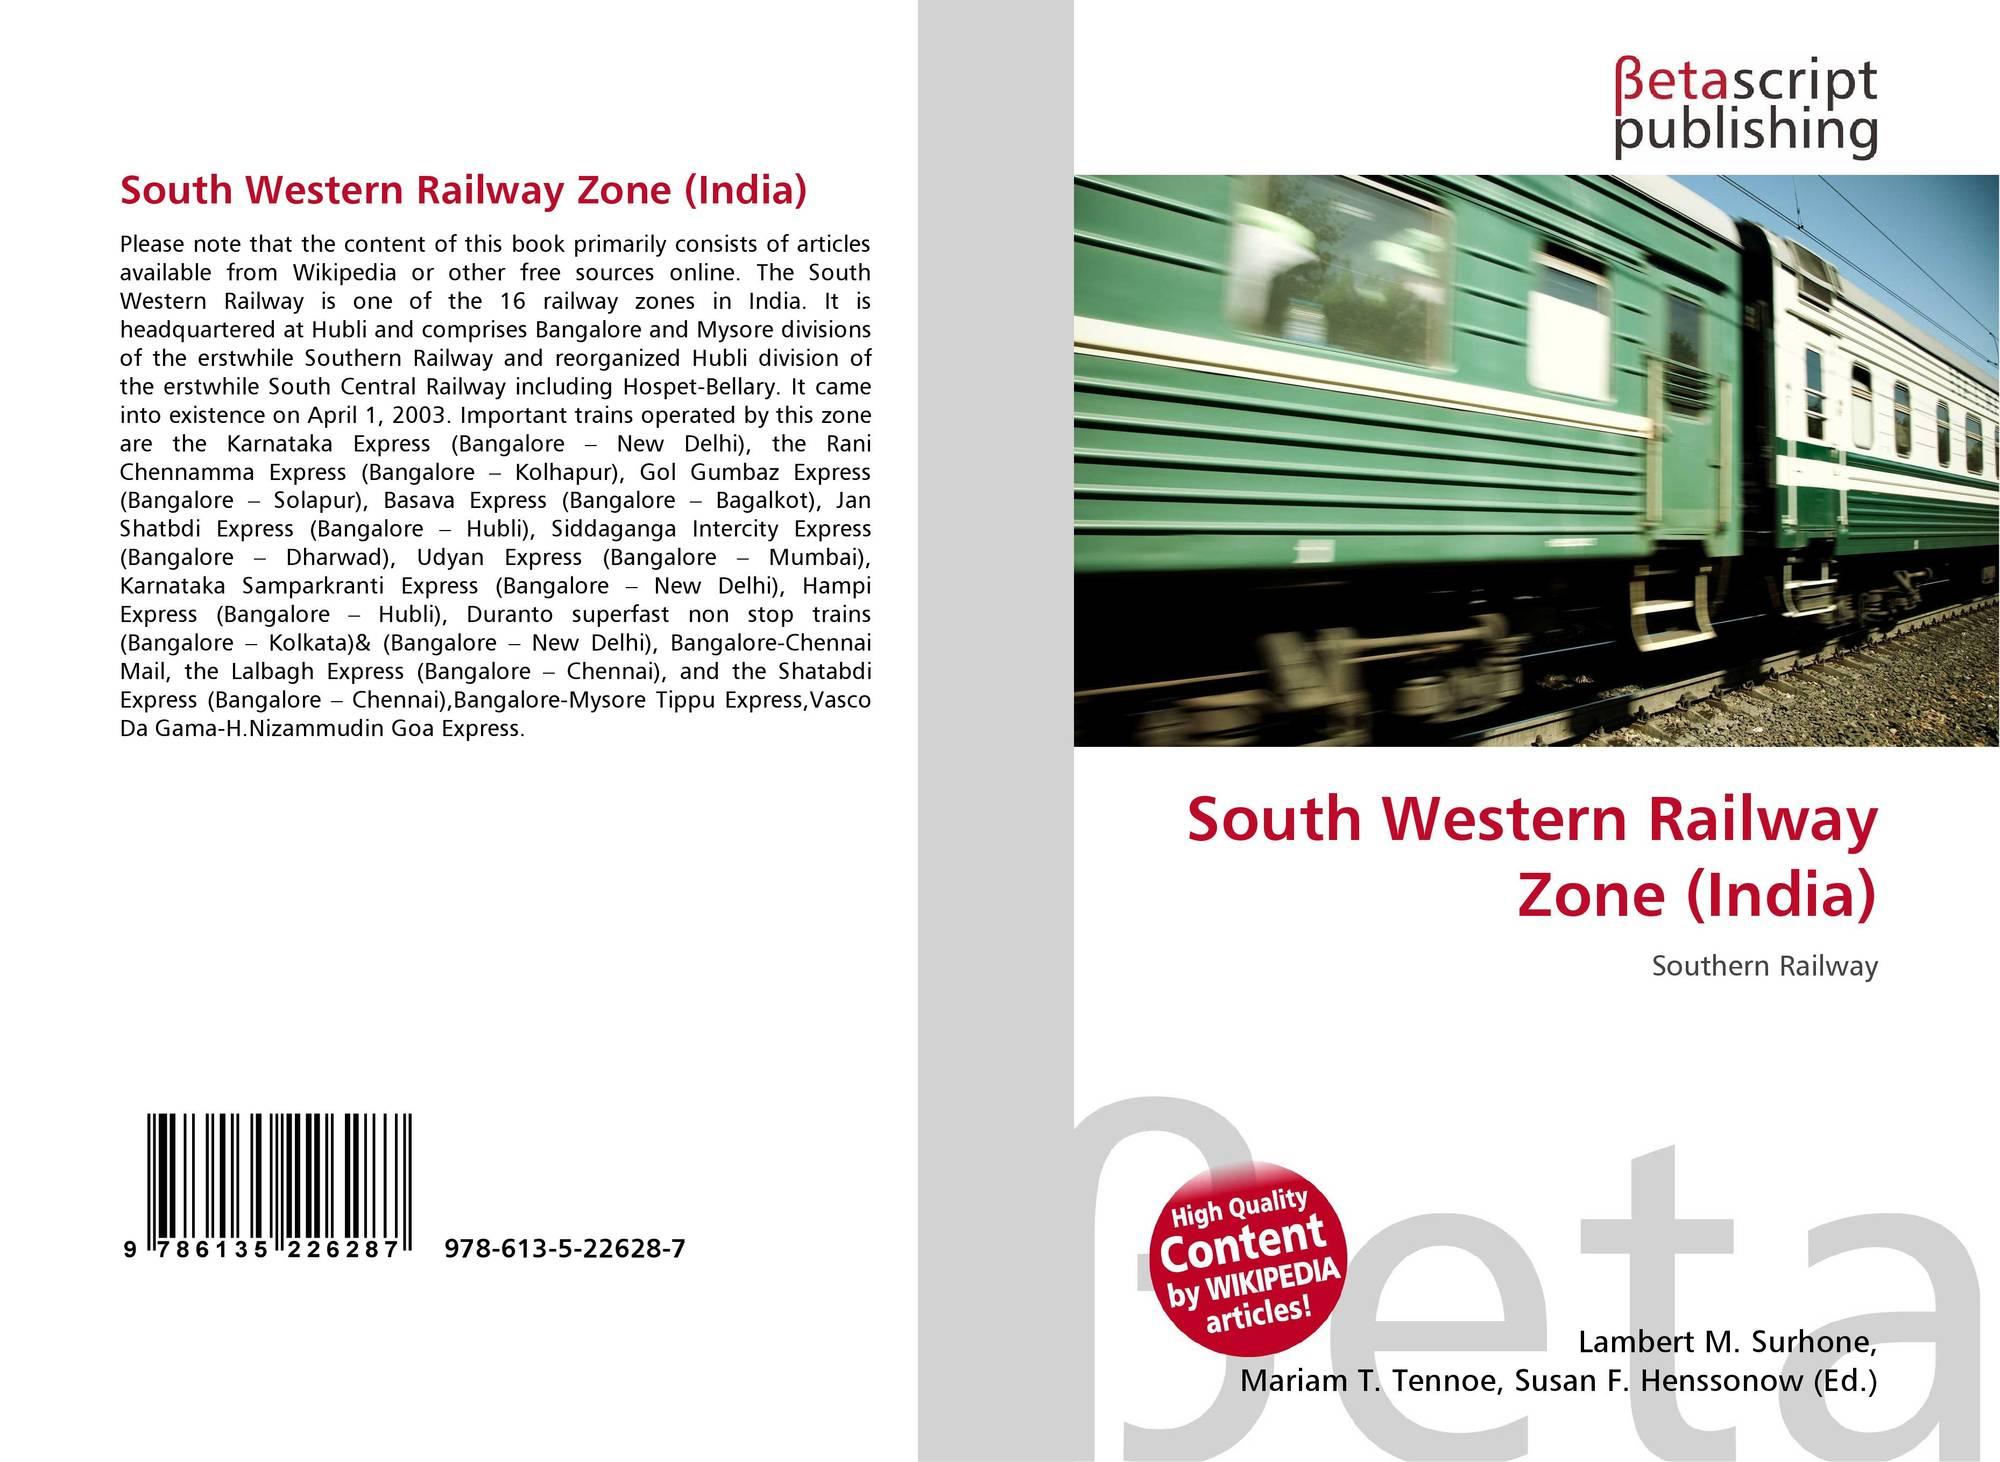 South Western Railway Zone (India), 978-613-5-22628-7